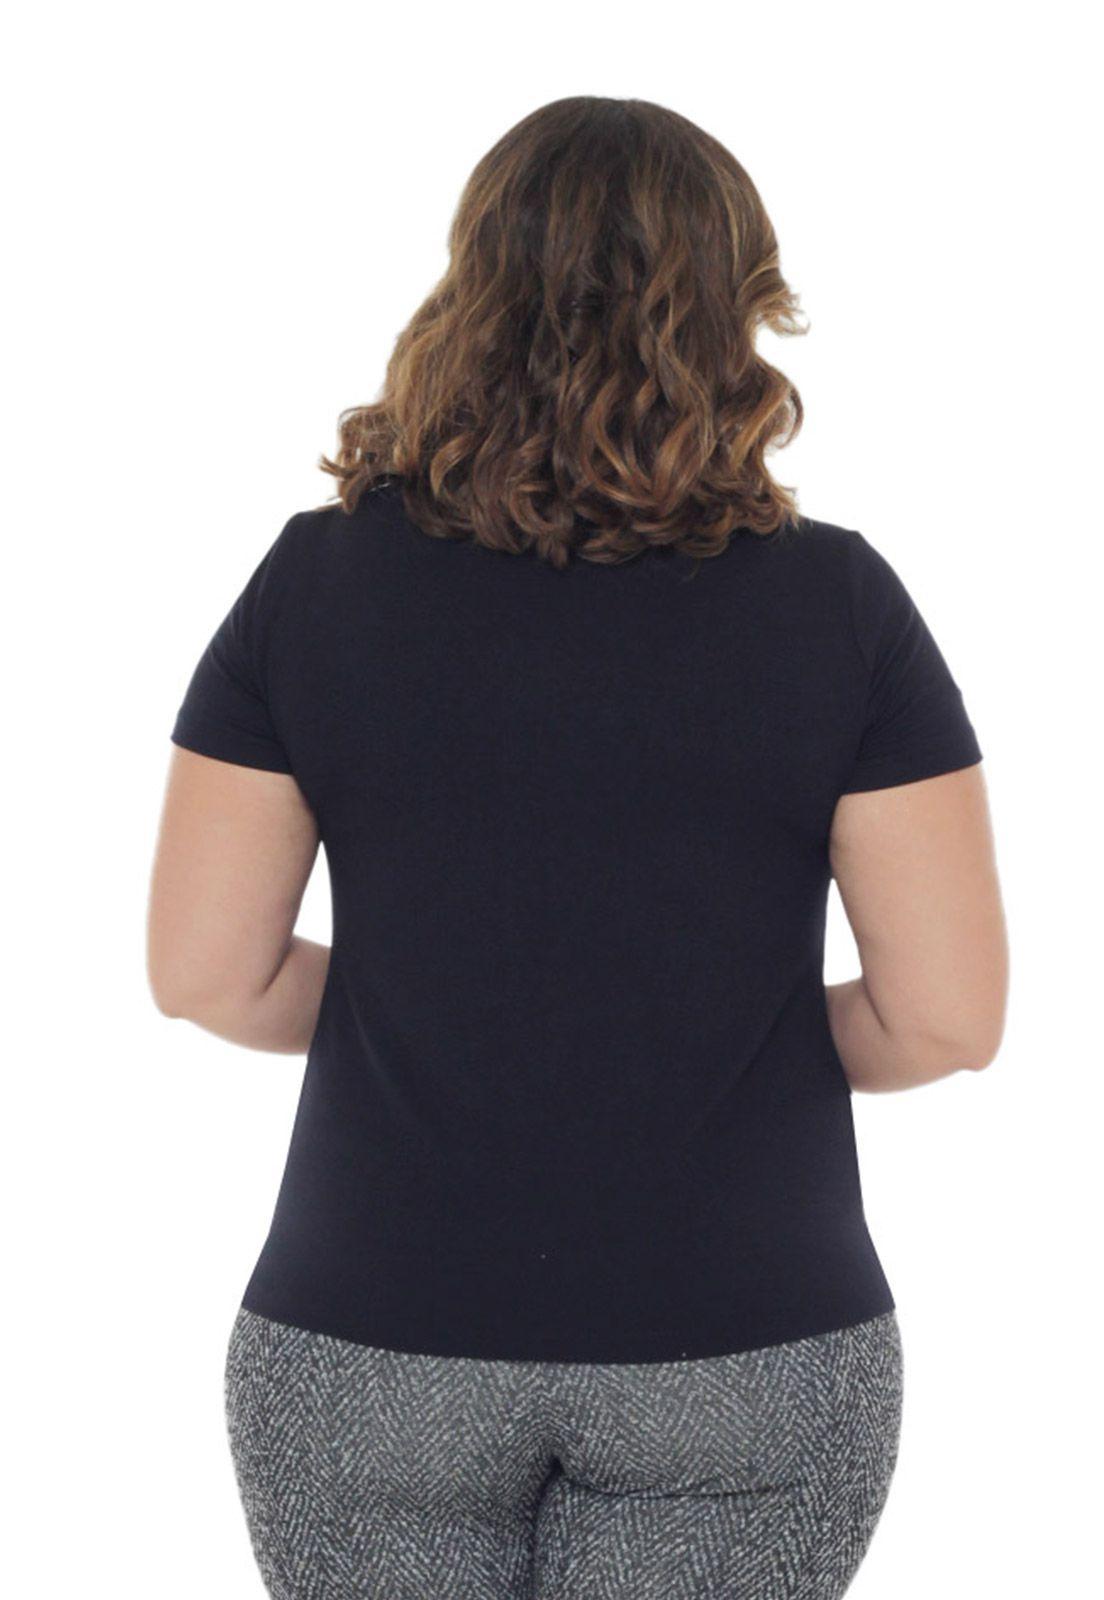 Blusa básica plus size gola careca